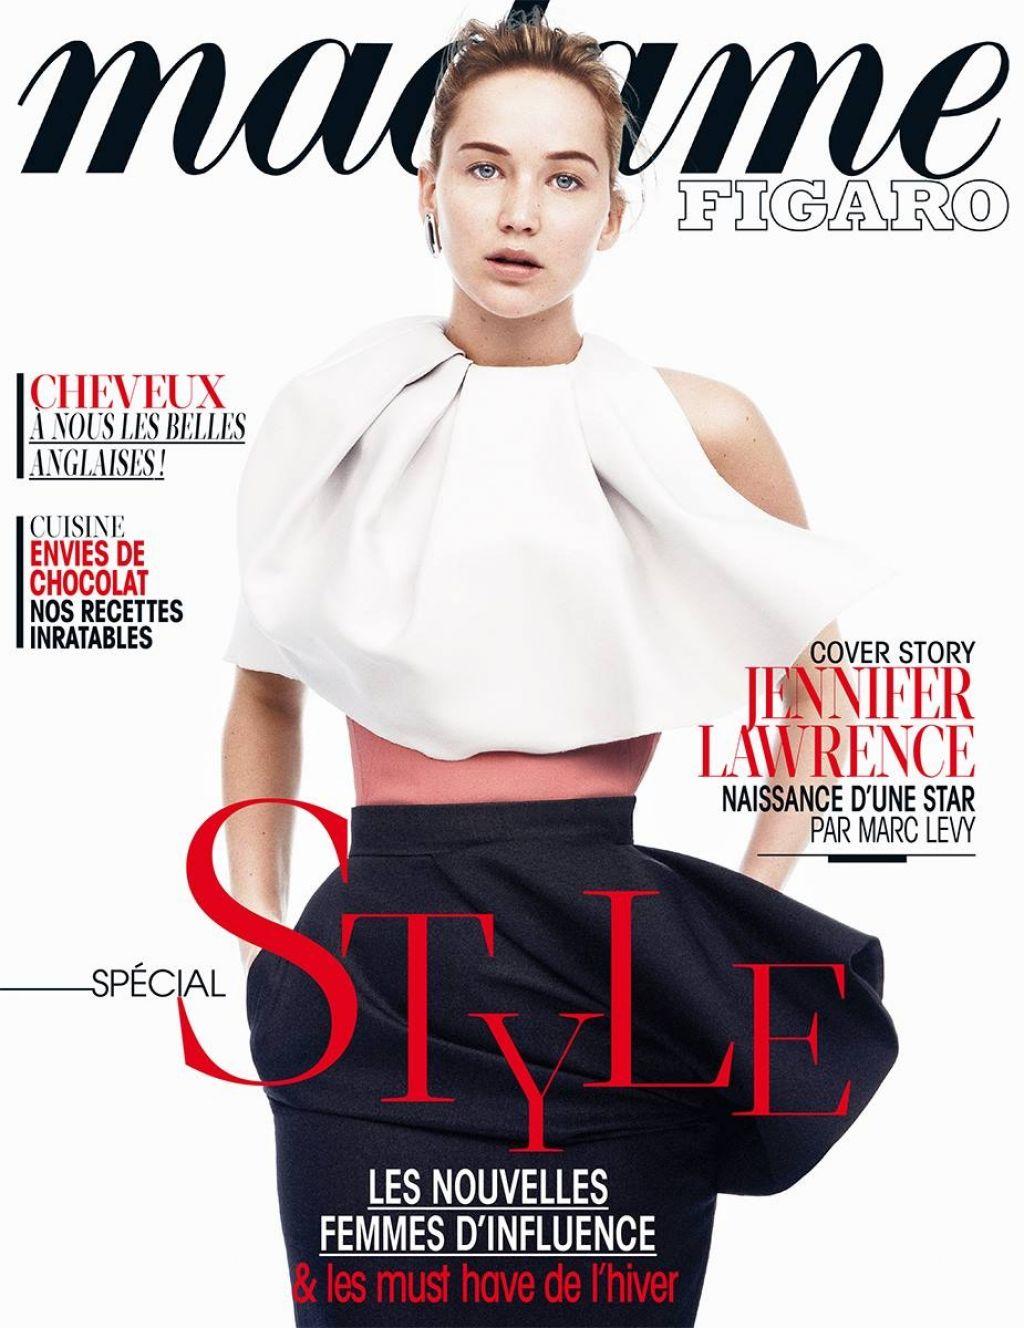 Jennifer Lawrence - MADAME FIGARO Magazine - Special Style Issue